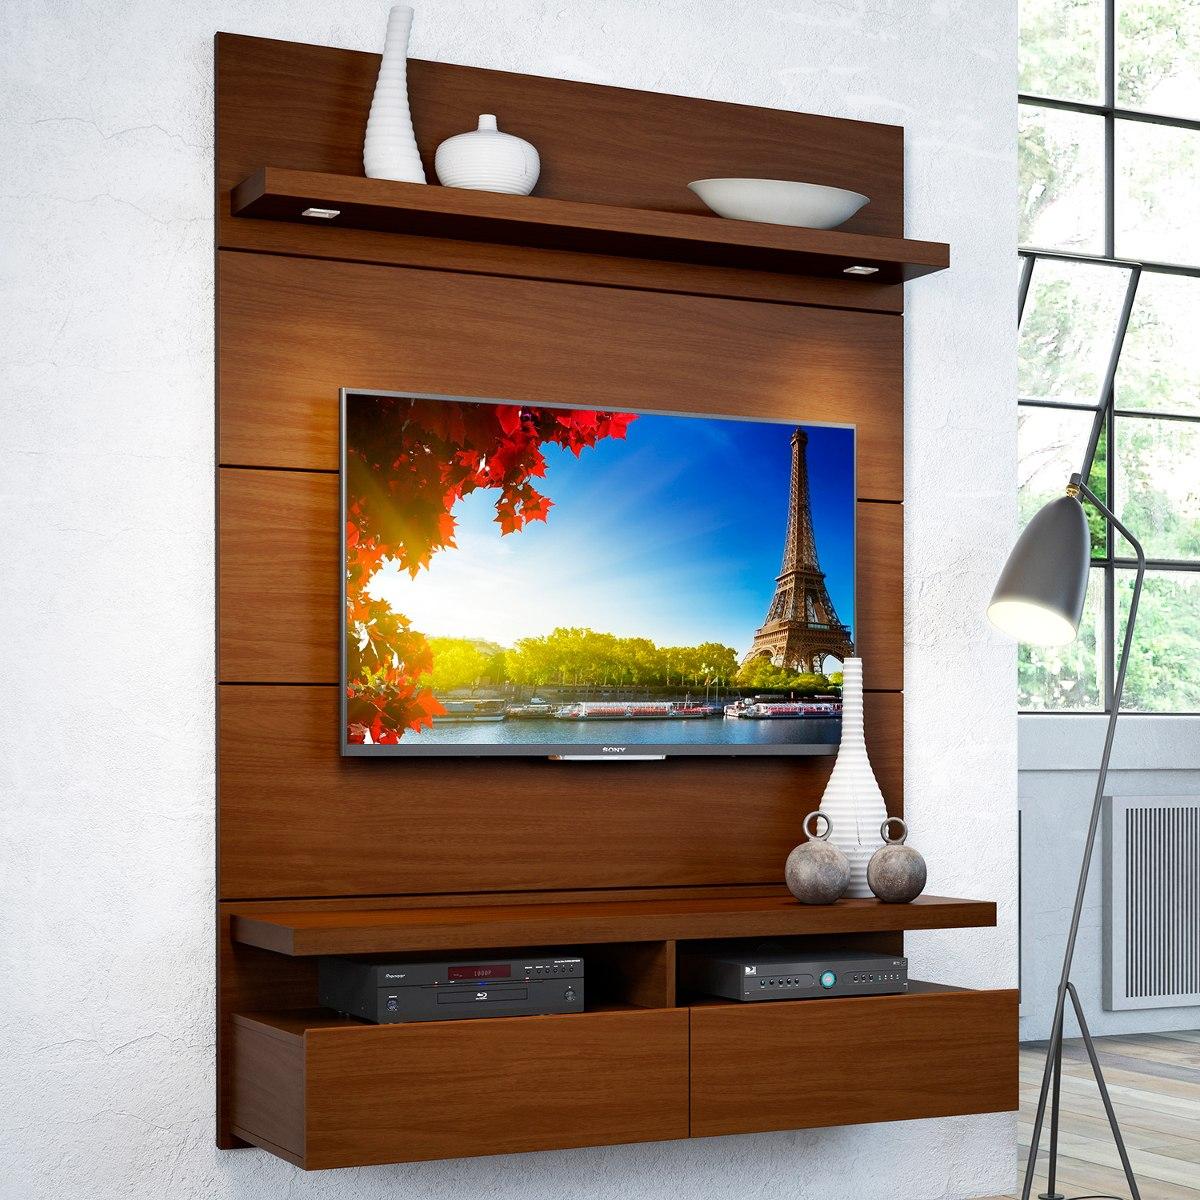 Mueble Tv Pared Interesting Pas De Amrica Forjado Hierro Estante  # Meuble Tv Yoop